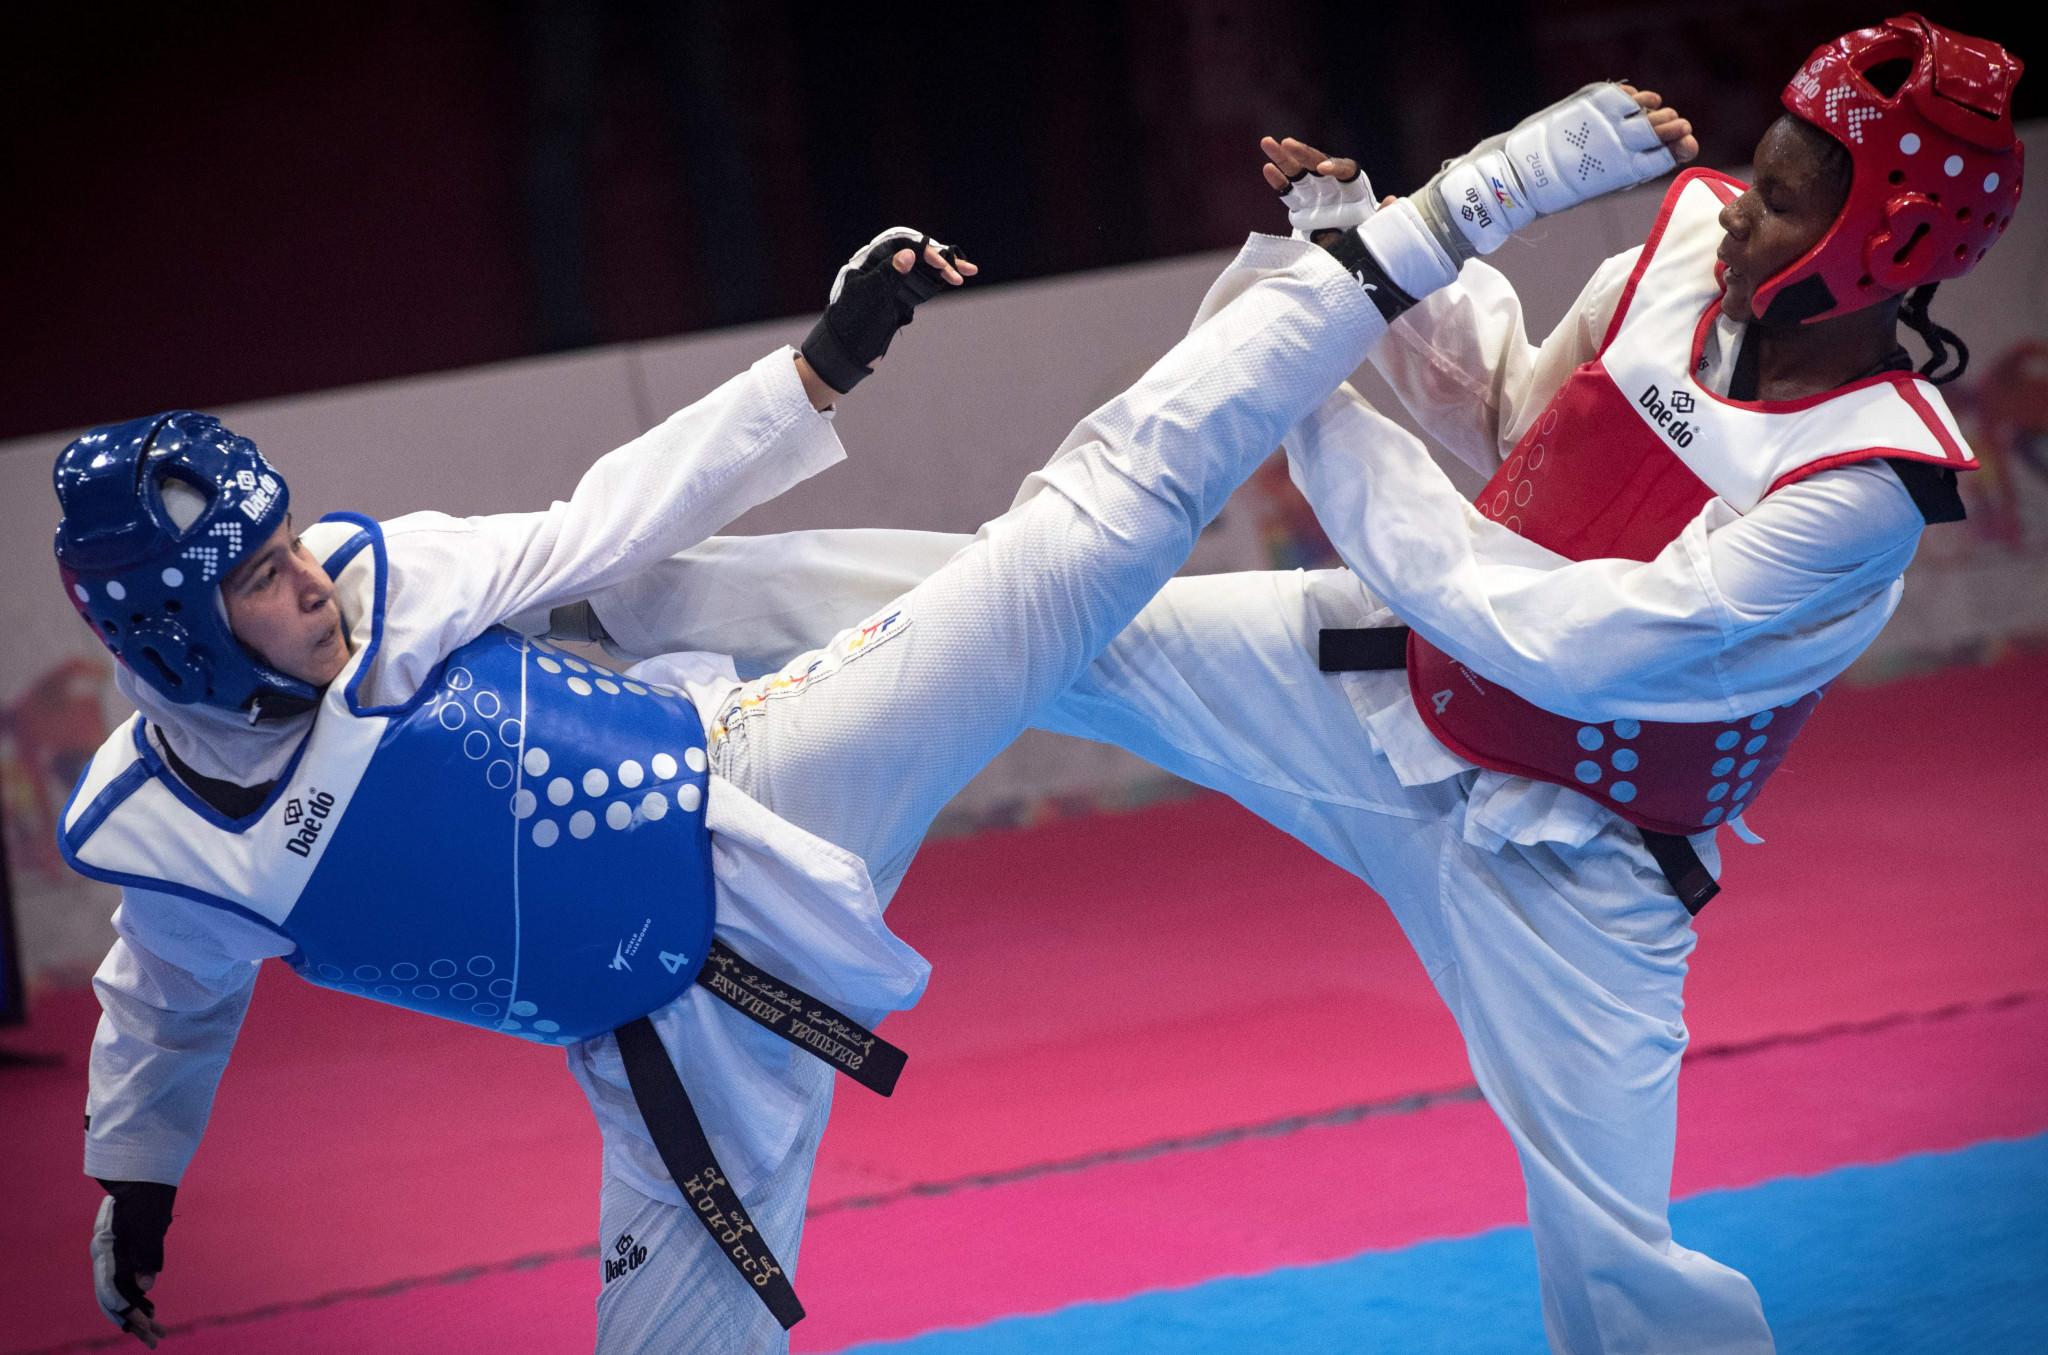 Kenya's only taekwondo representative at Tokyo 2020 targeting podium finish